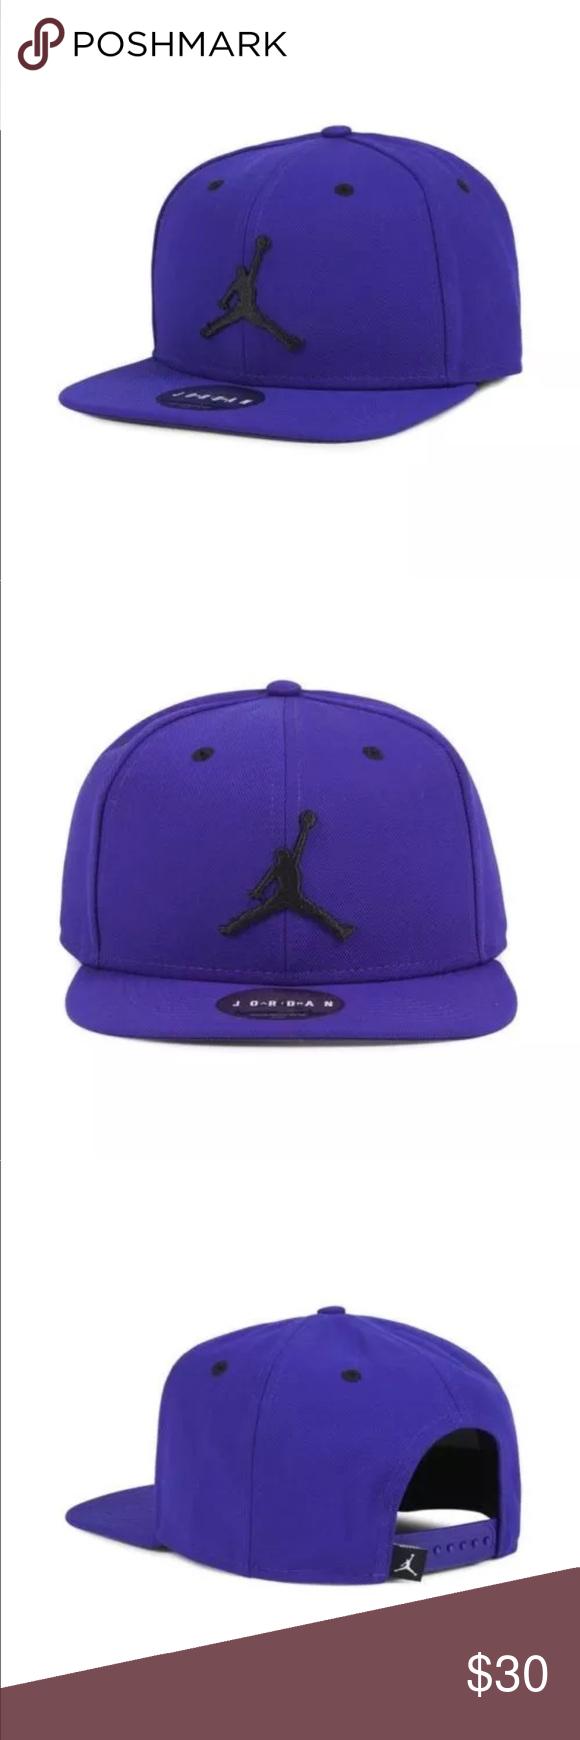 74106cc9df6c9a Nike Adult Air Jordan Jumpman Royal Blue Black Ret Nike Adult Air Jordan  Jumpman Royal Blue